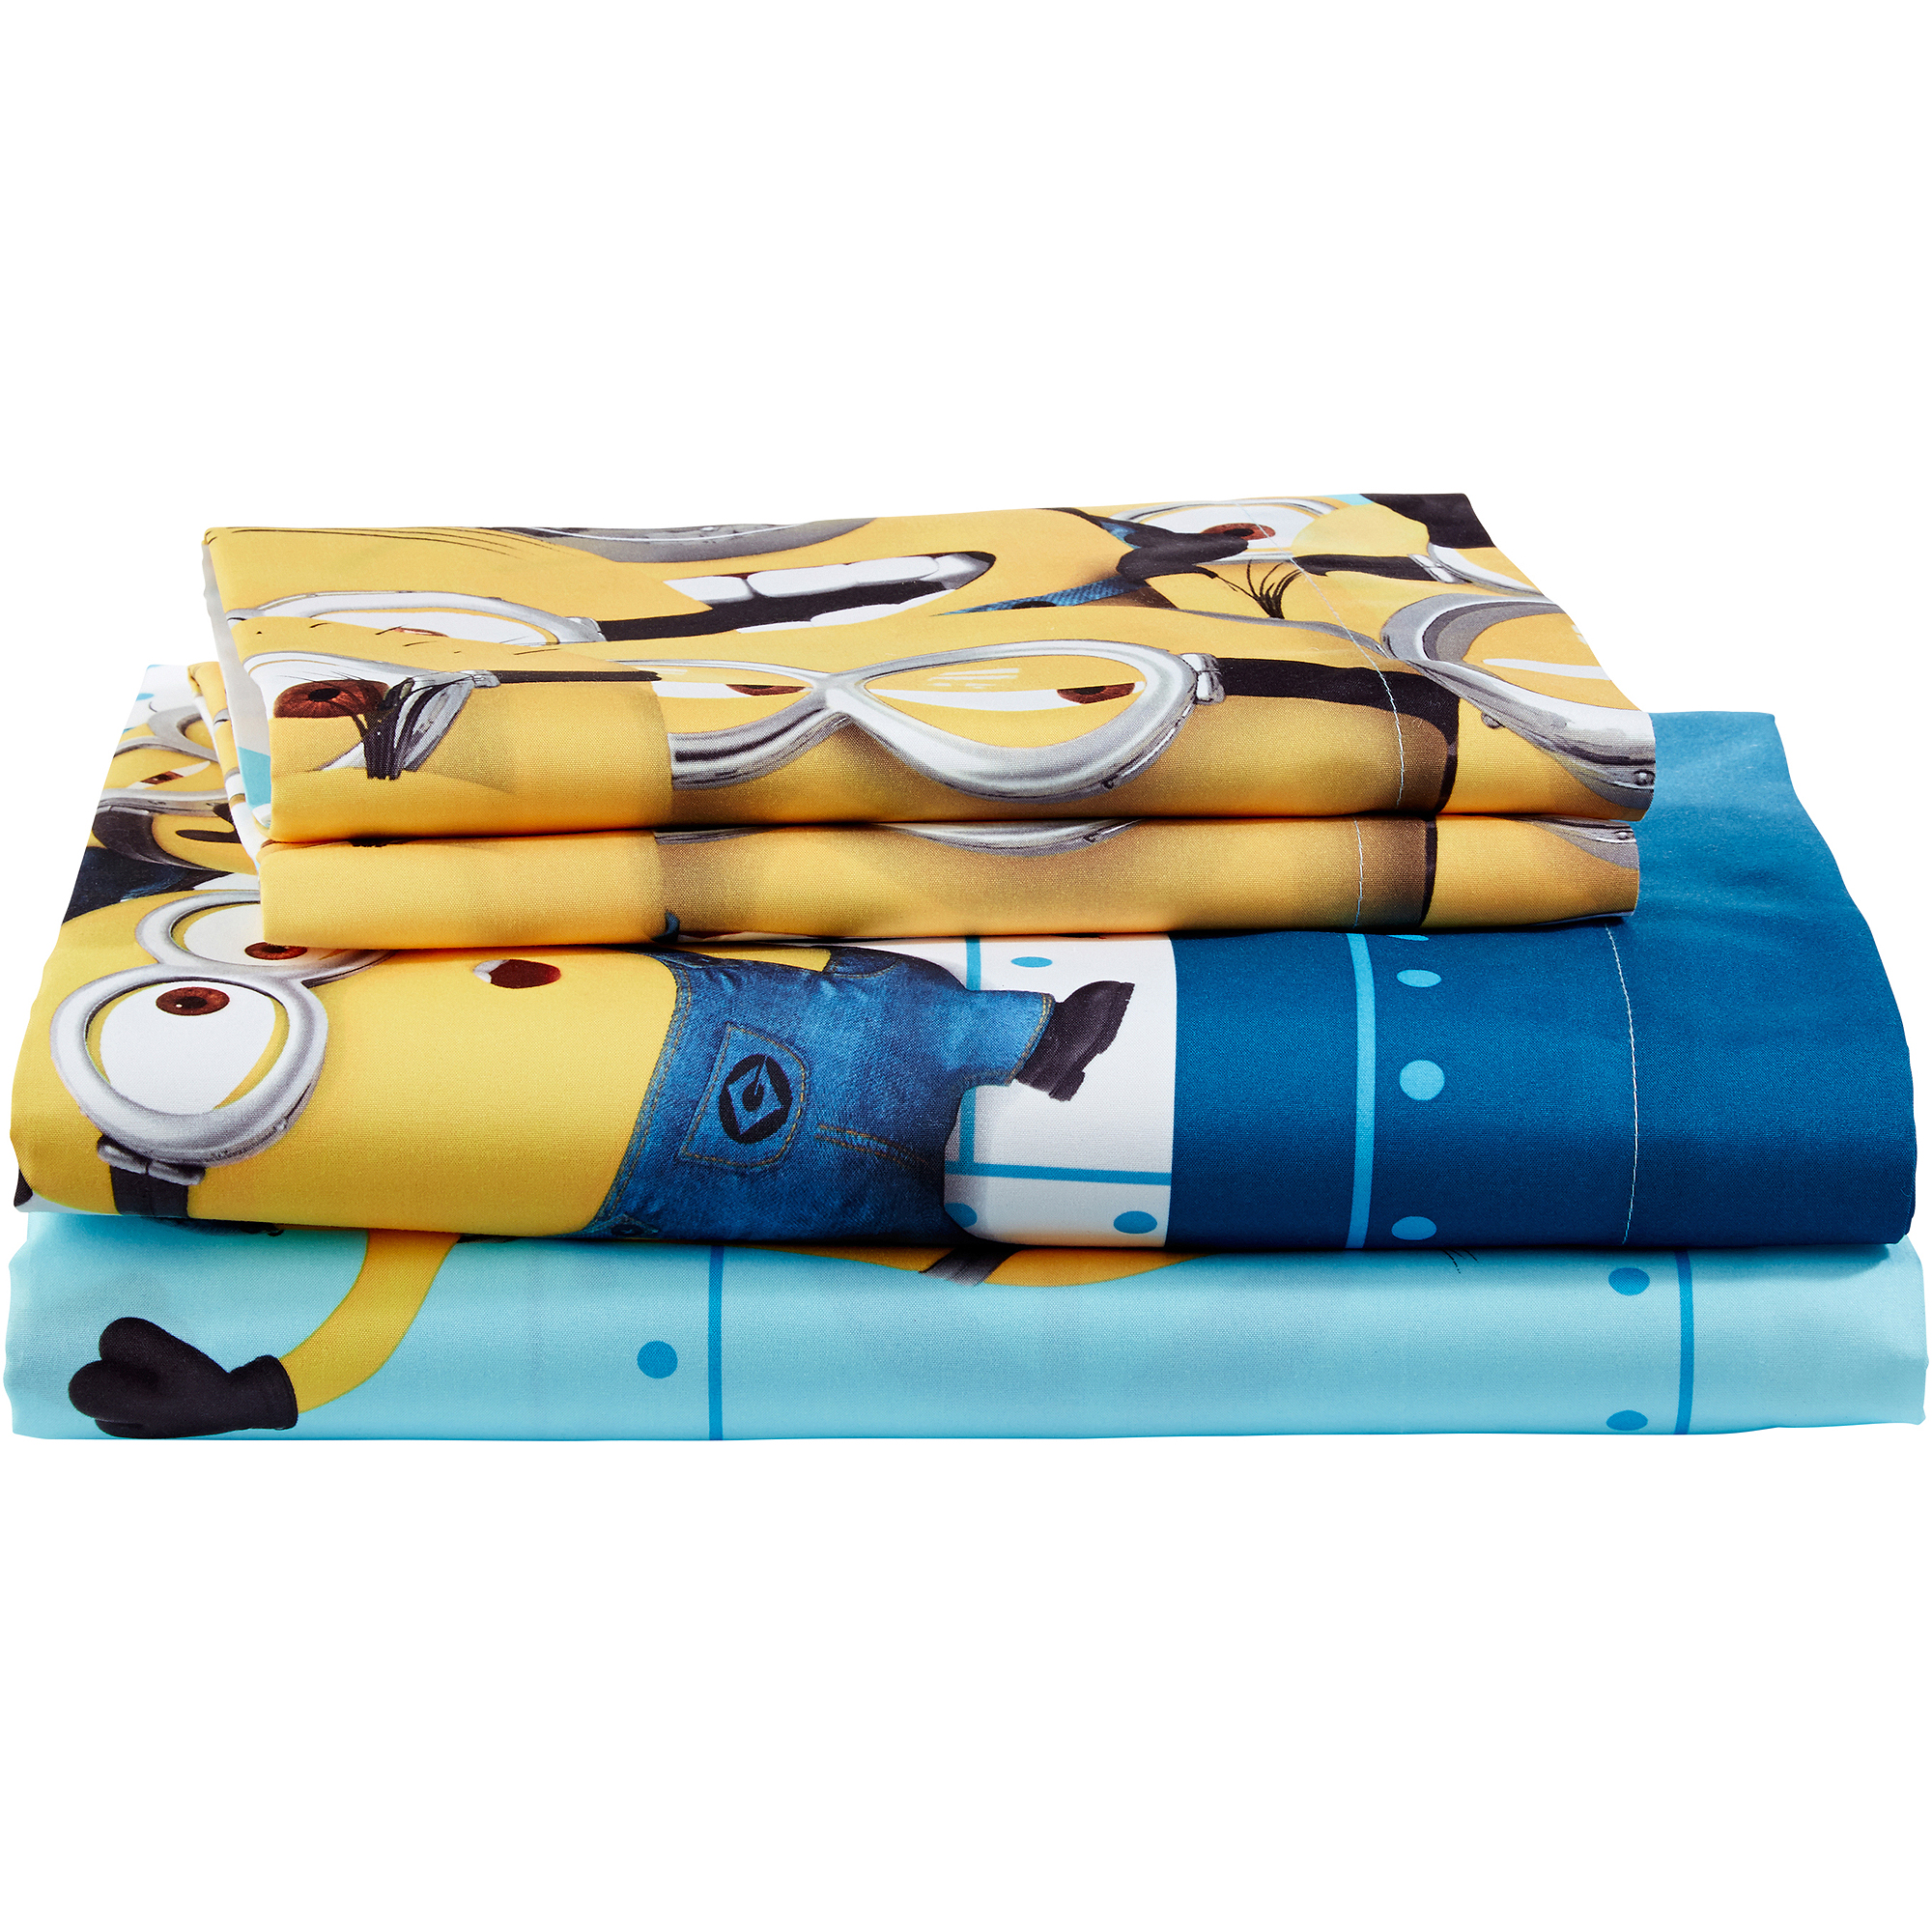 Minions Crib Bedding Set Cheap Online